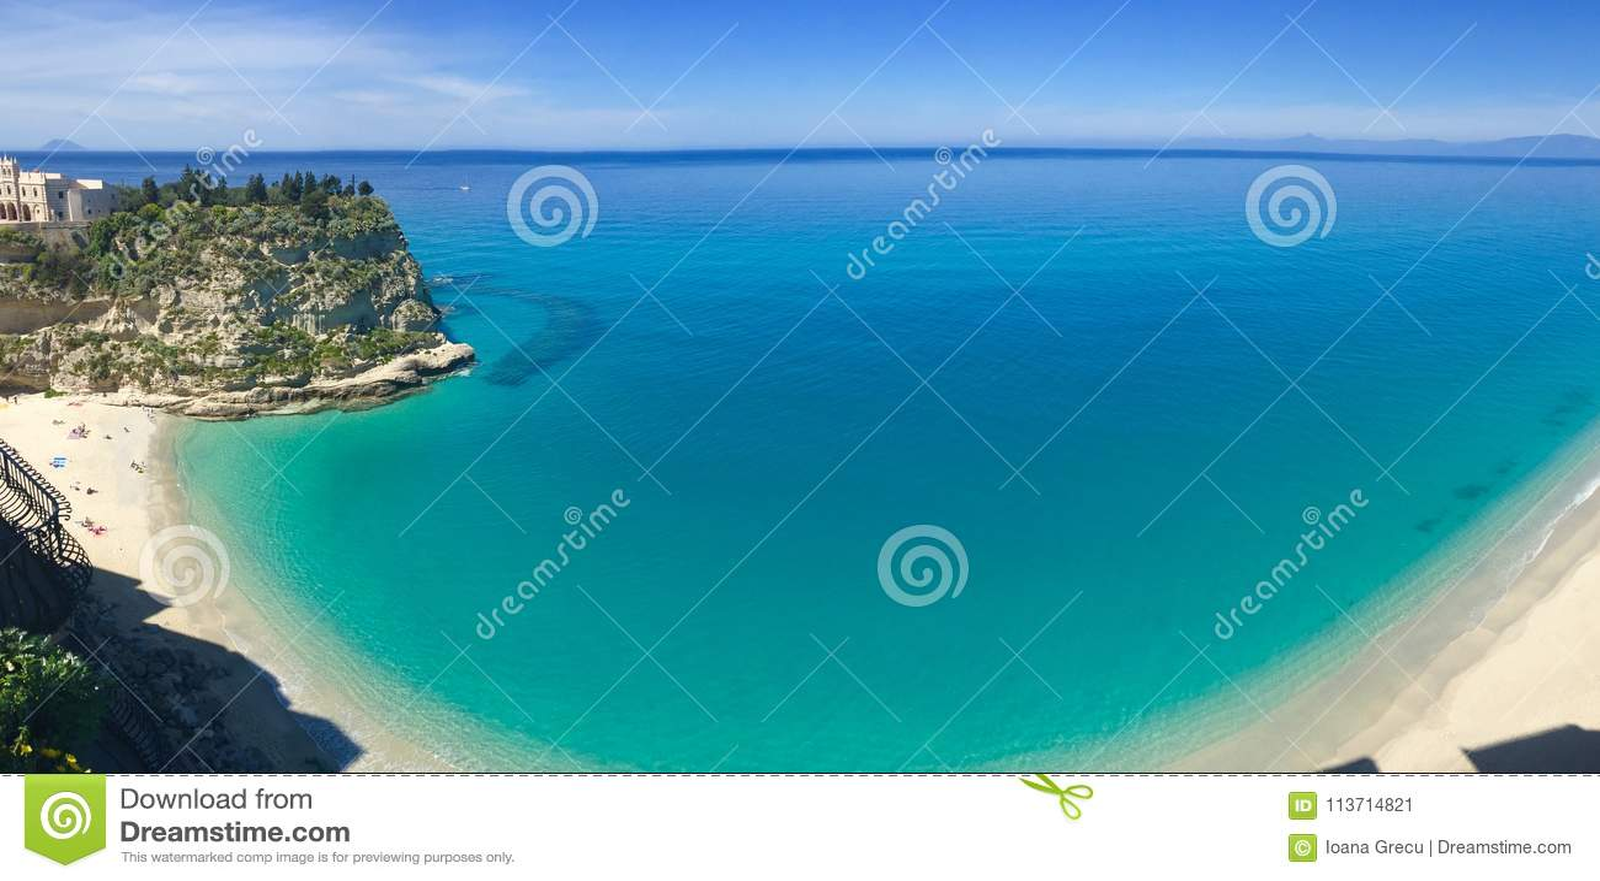 Panorama of the beach of Tropea, italy